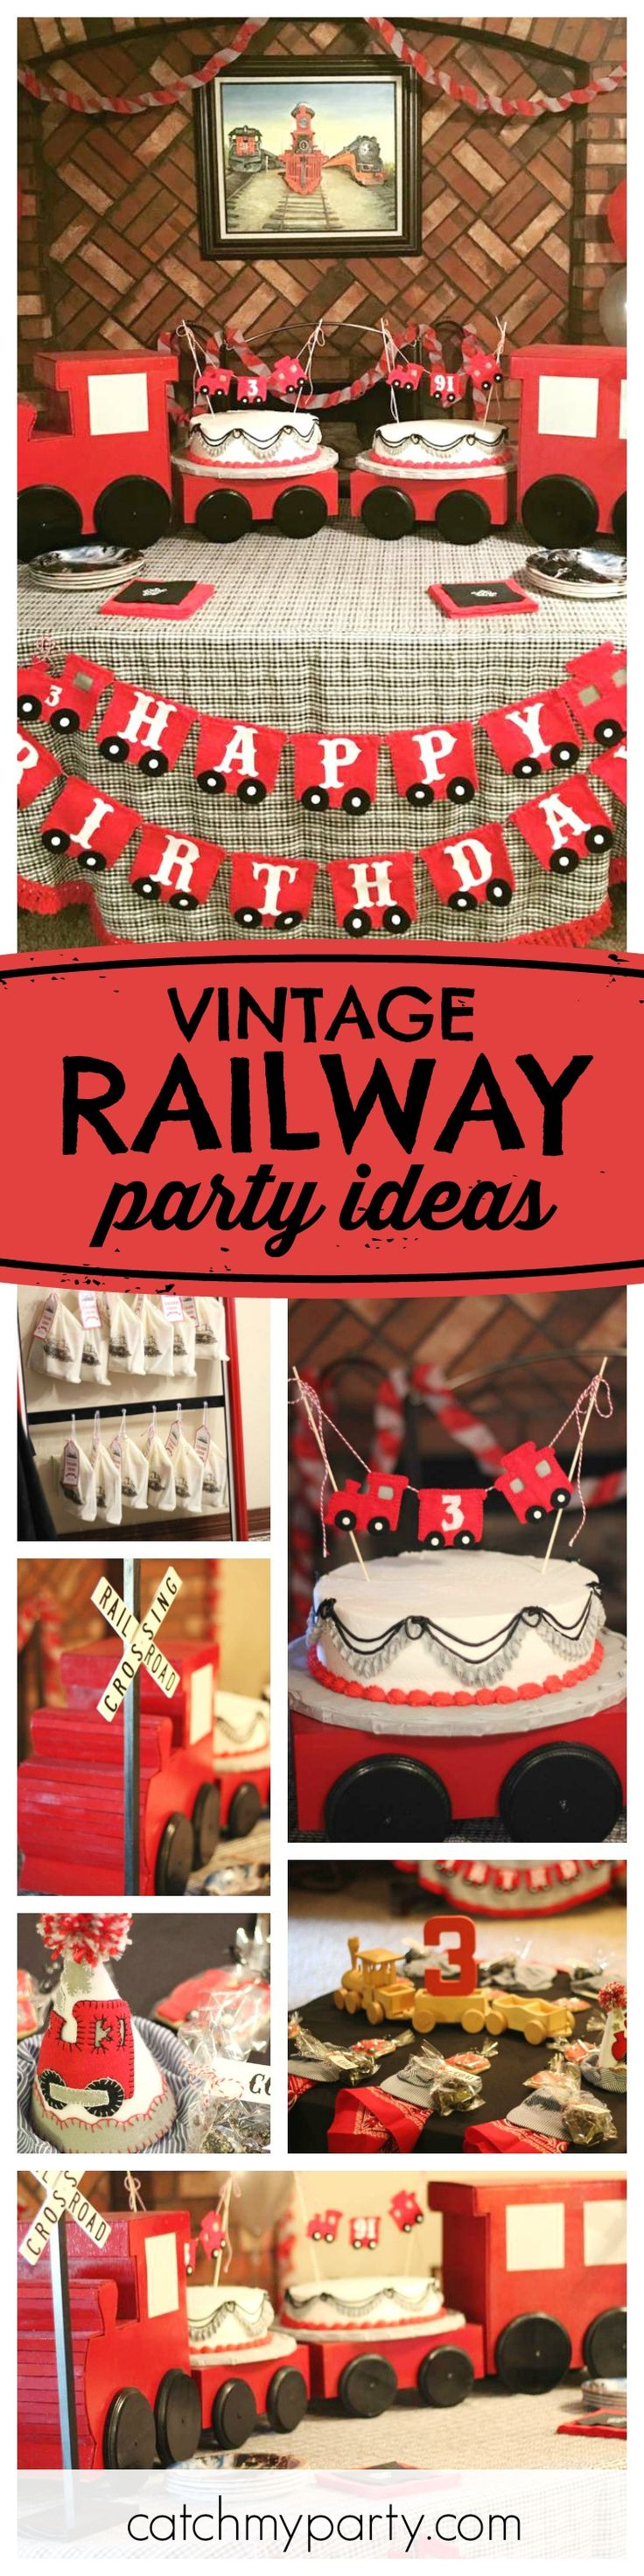 185 best Train Party Ideas images on Pinterest